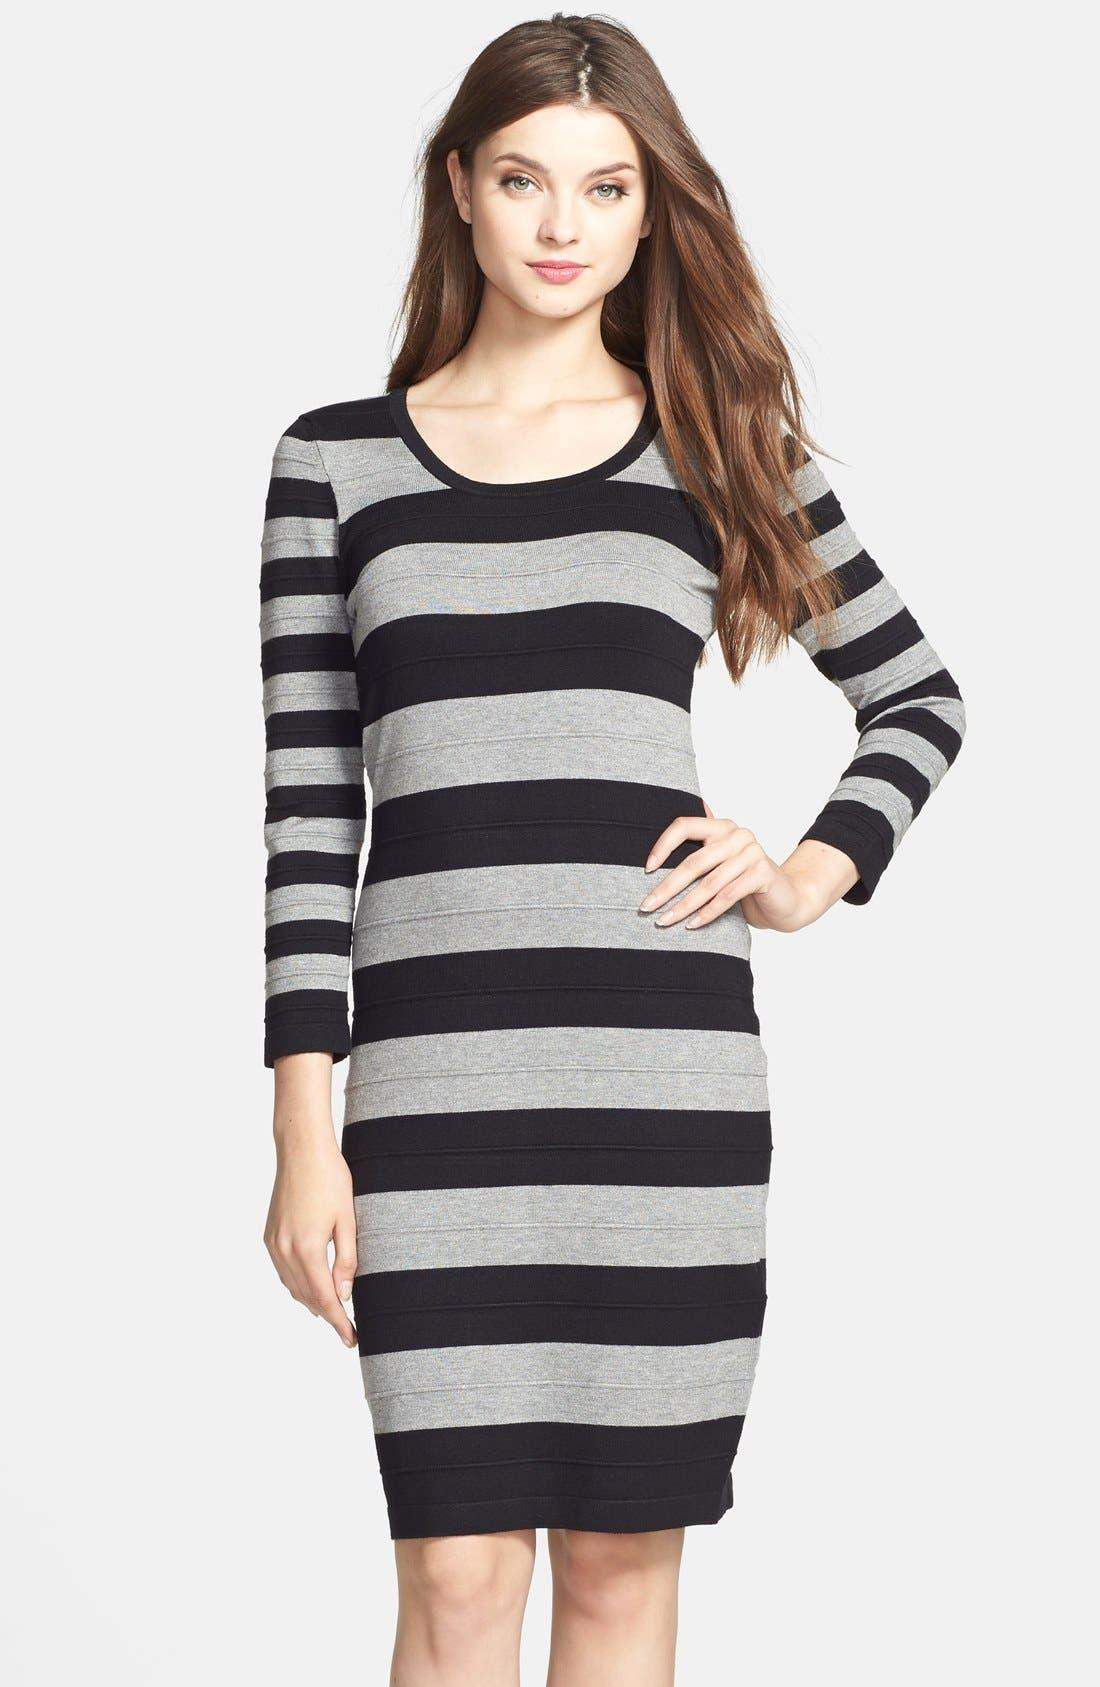 Alternate Image 1 Selected - Gabby Skye Stripe Sweater Dress